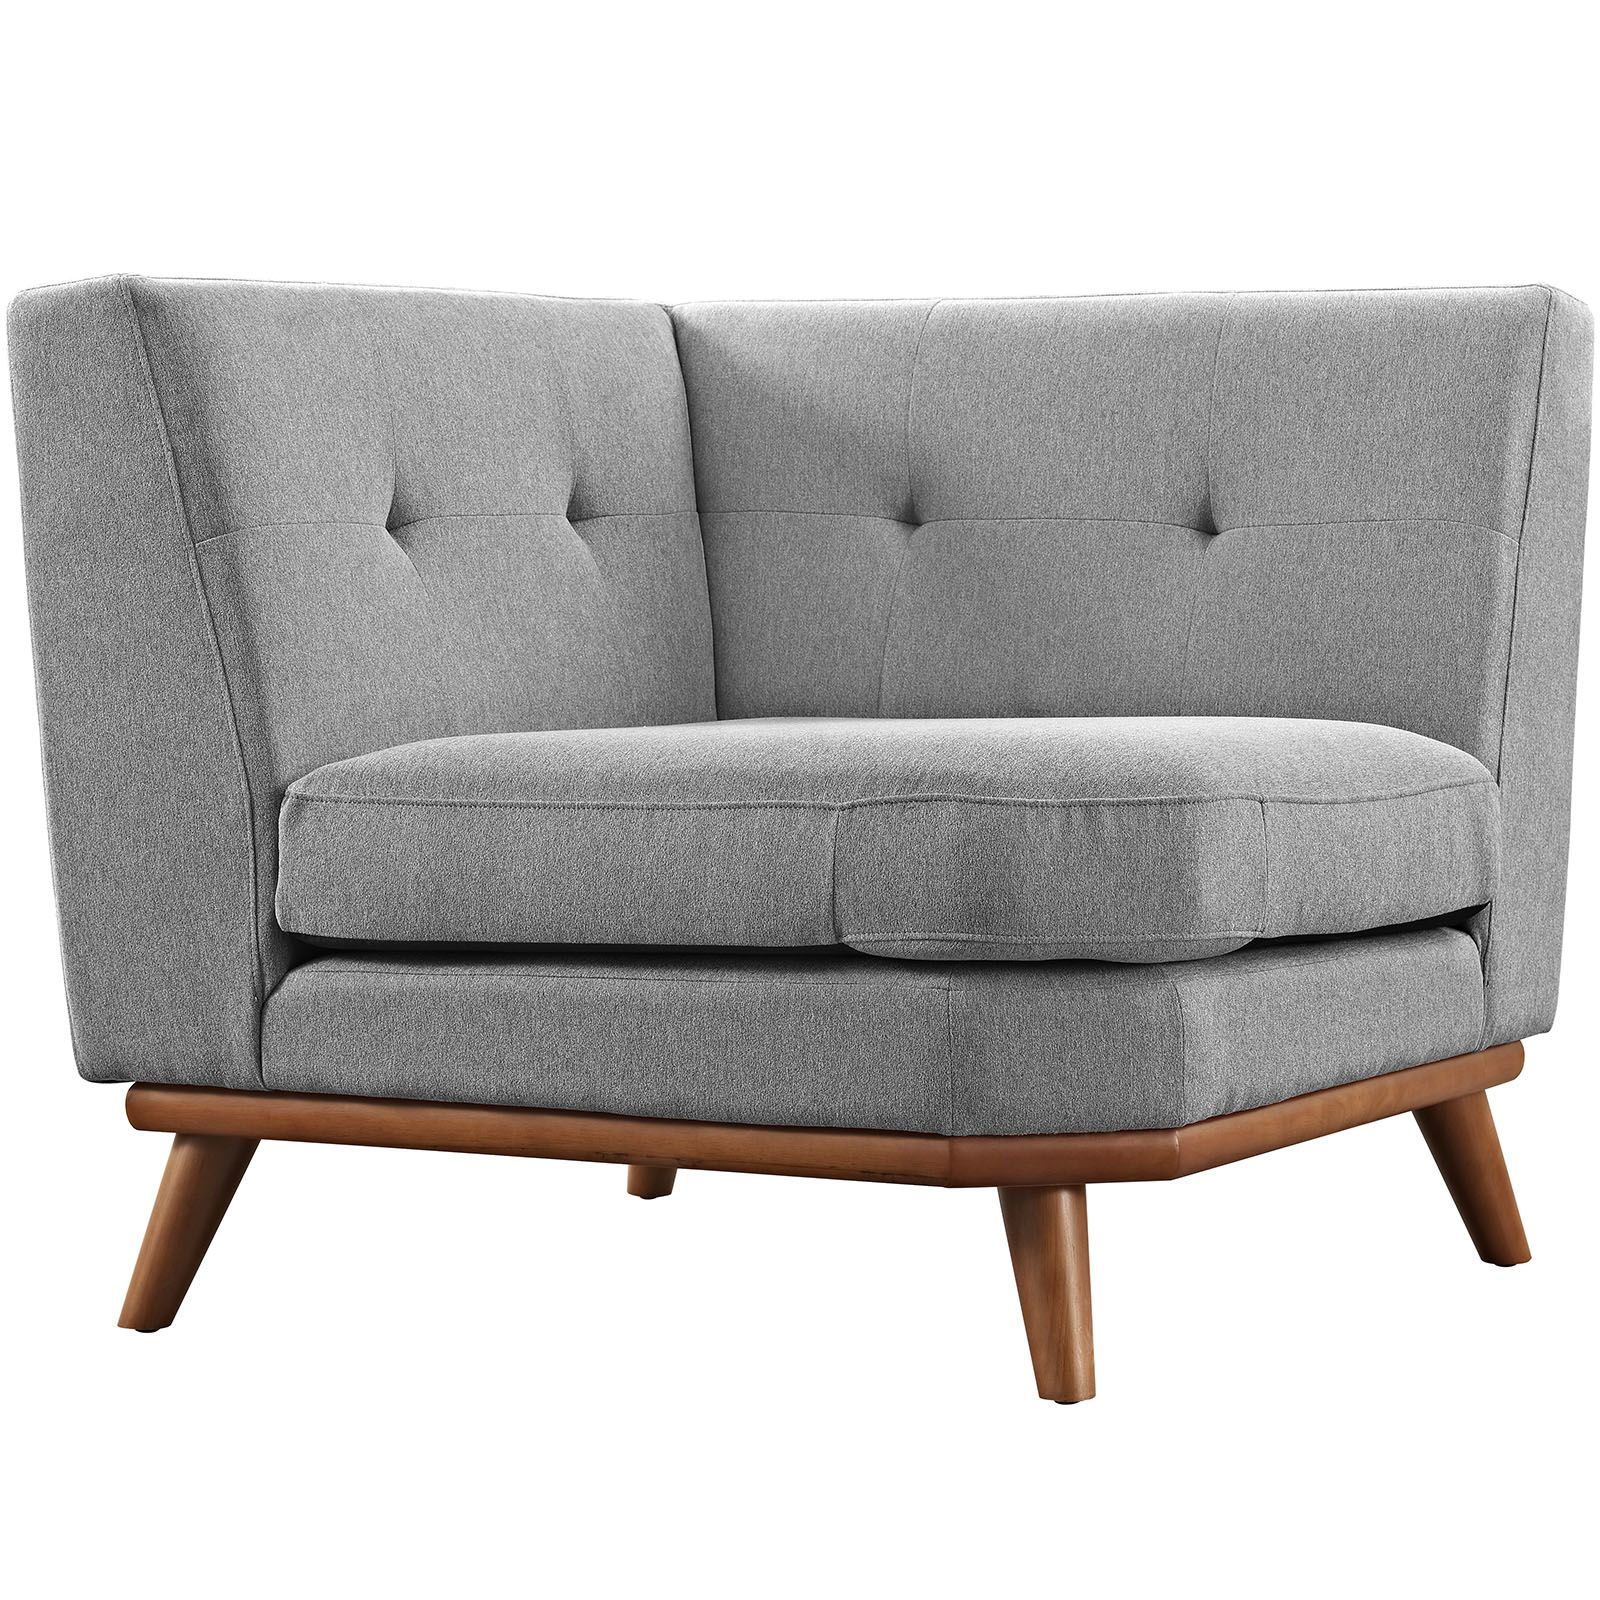 Engage Corner Sofa In 2020 Corner Sofa Set Grey Corner Sofa Corner Sofa